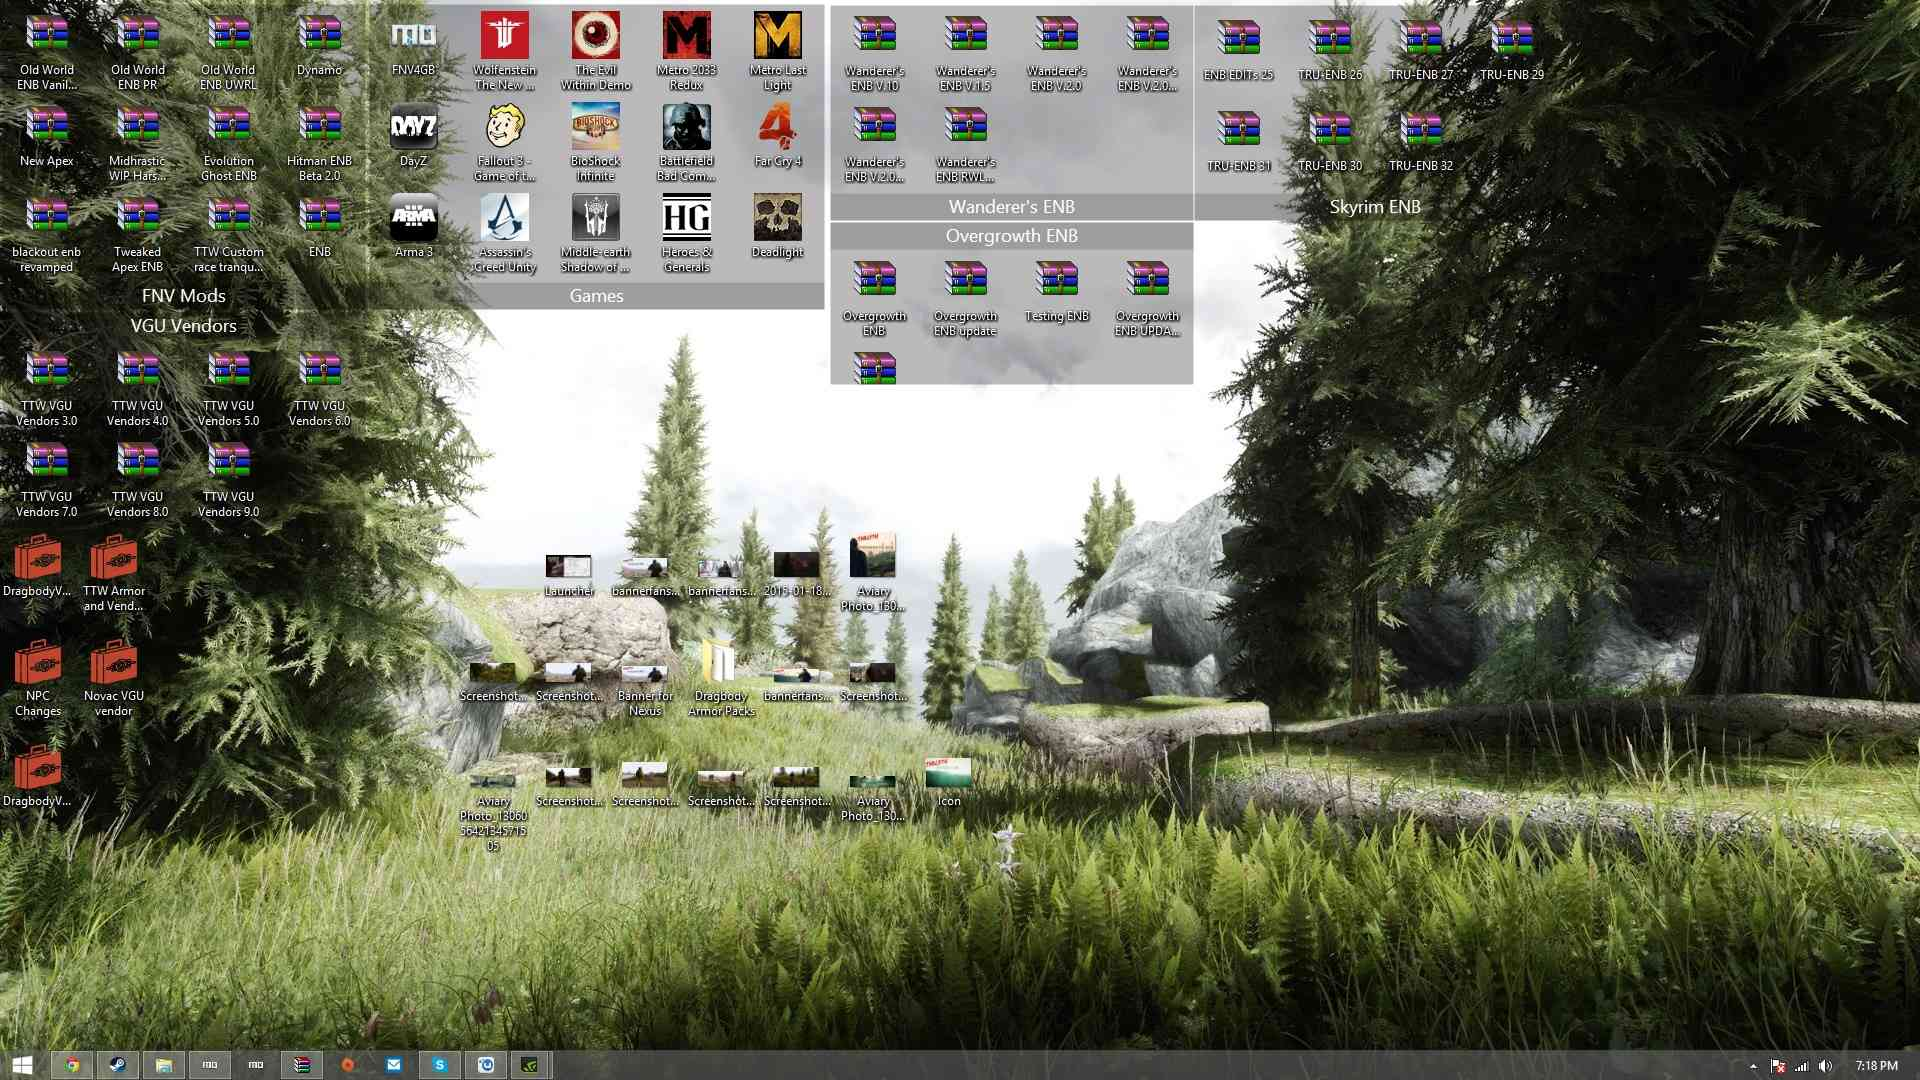 What Does Your Desktop Look Like? Deskto11